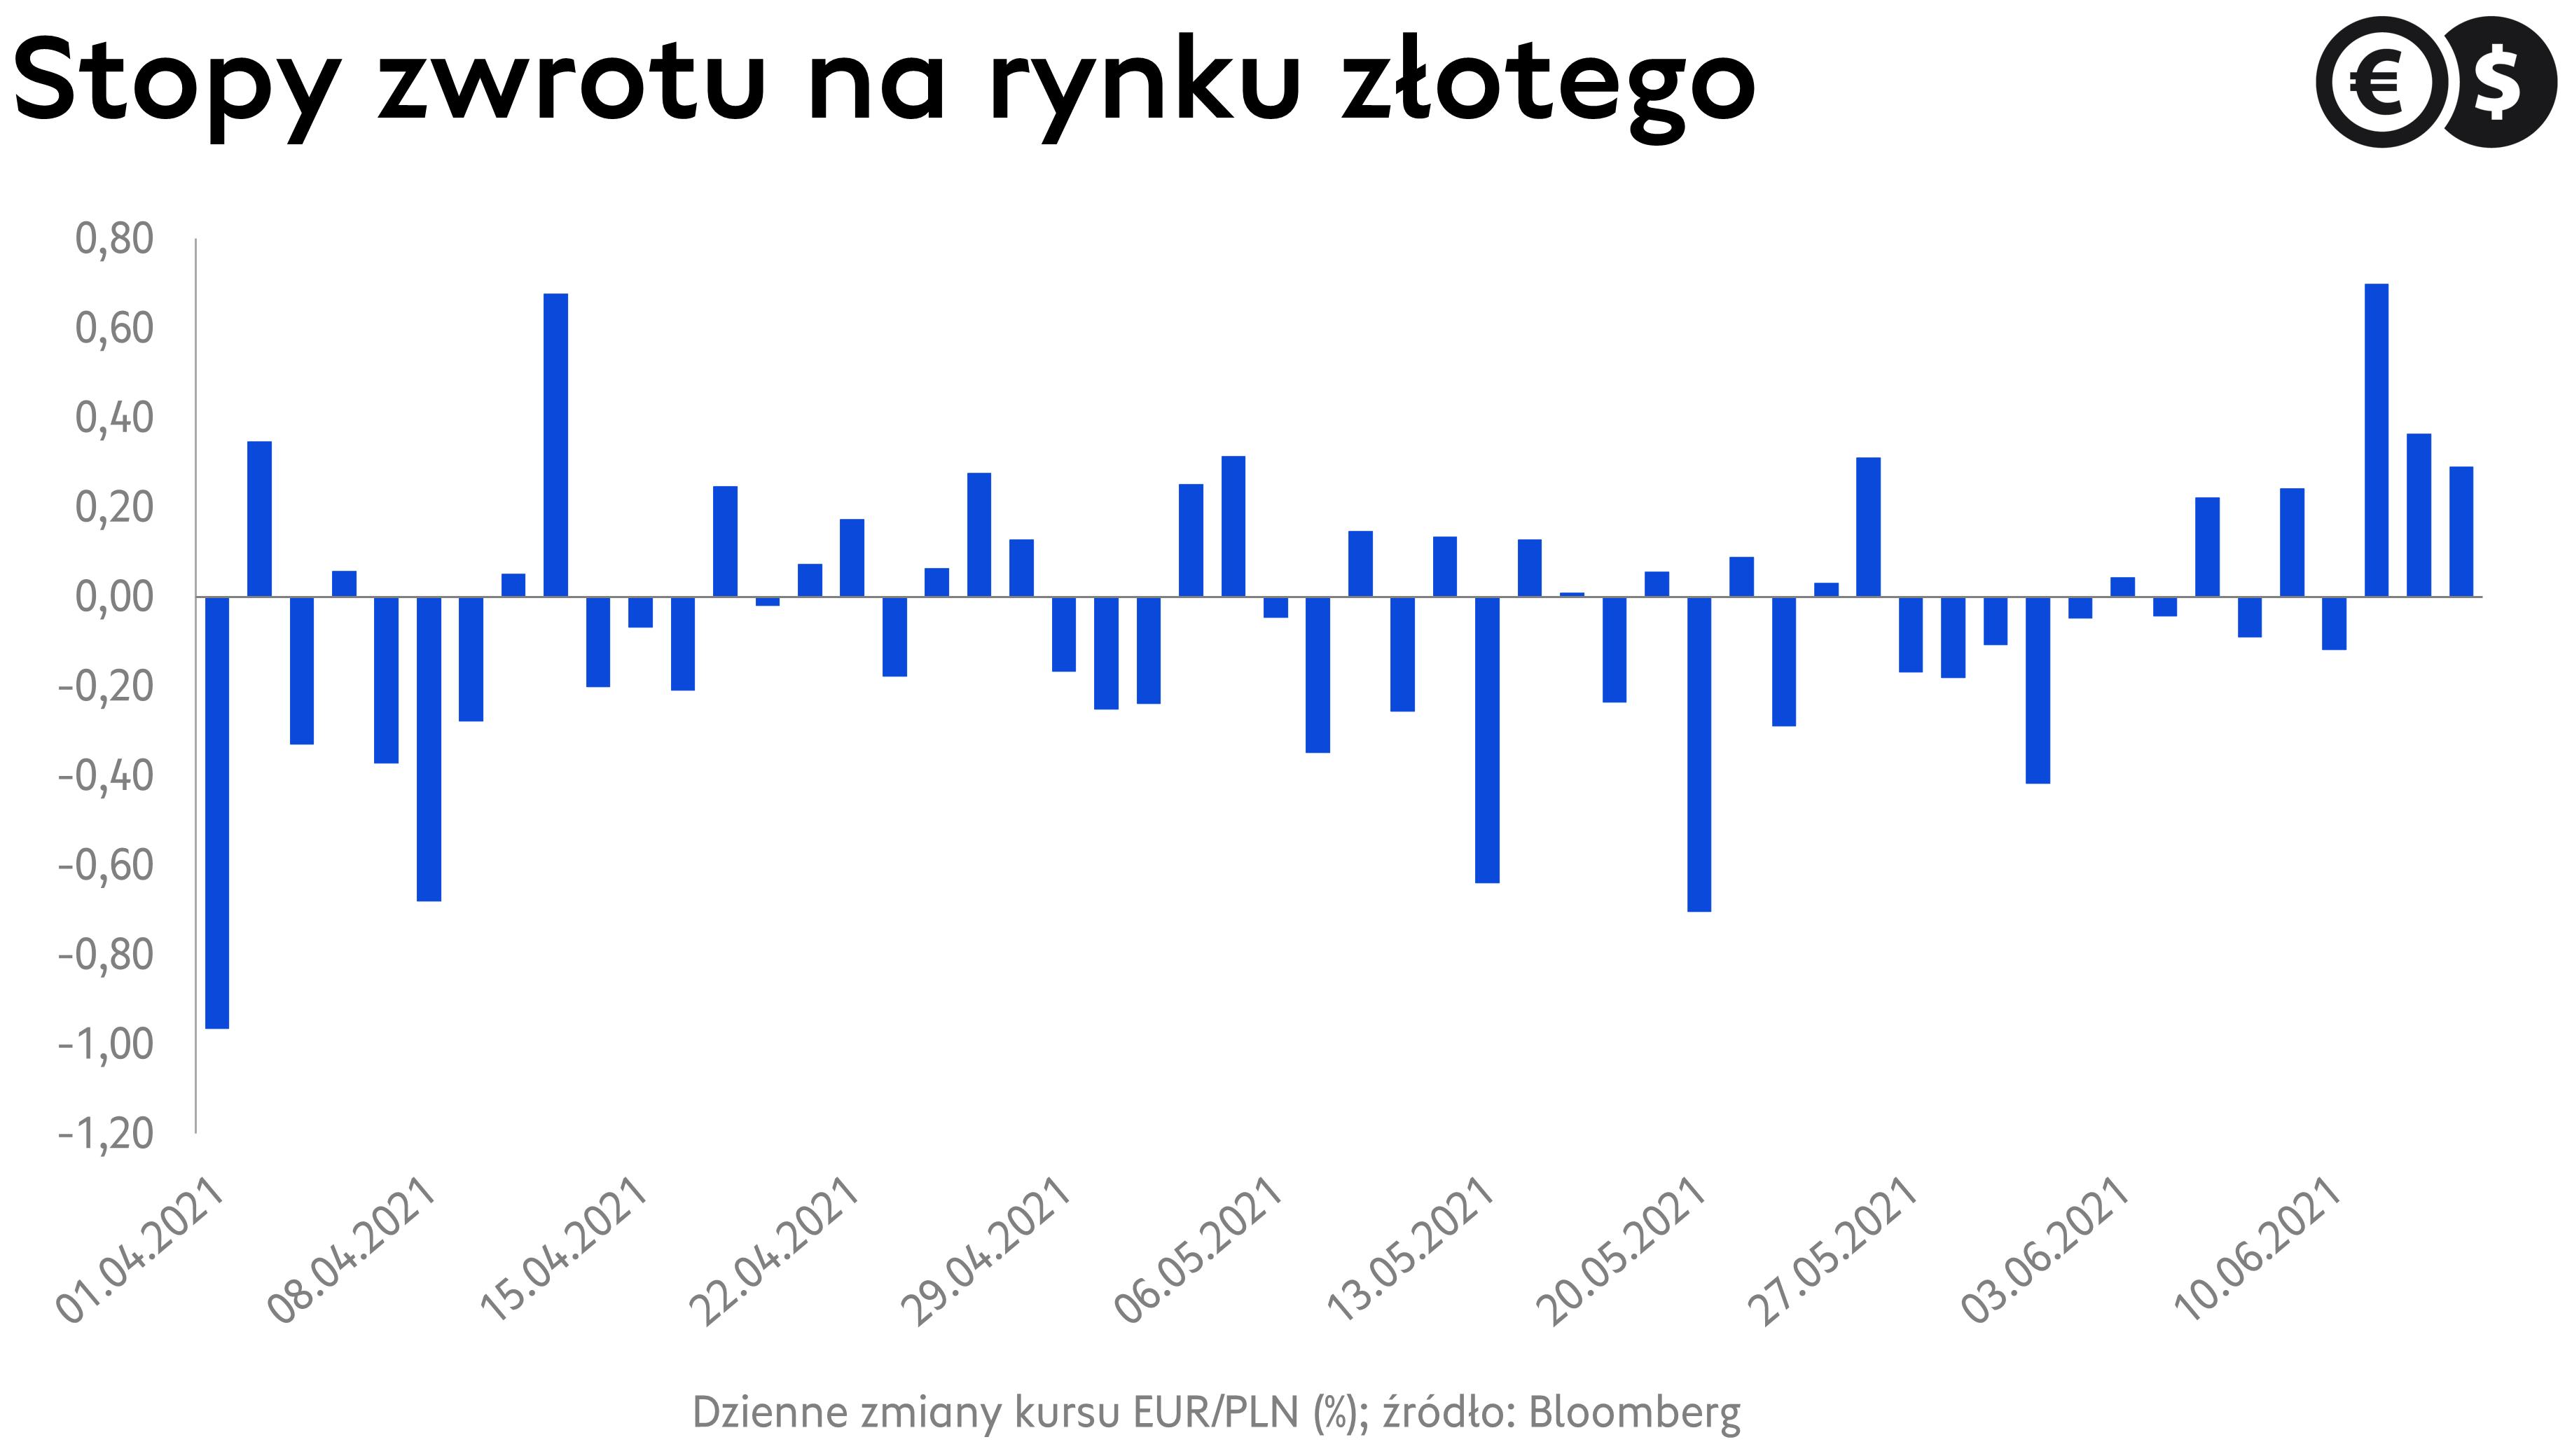 Kurs euro, dzienne stopy zwrotu EUR/PLN; źródło: Bloomberg